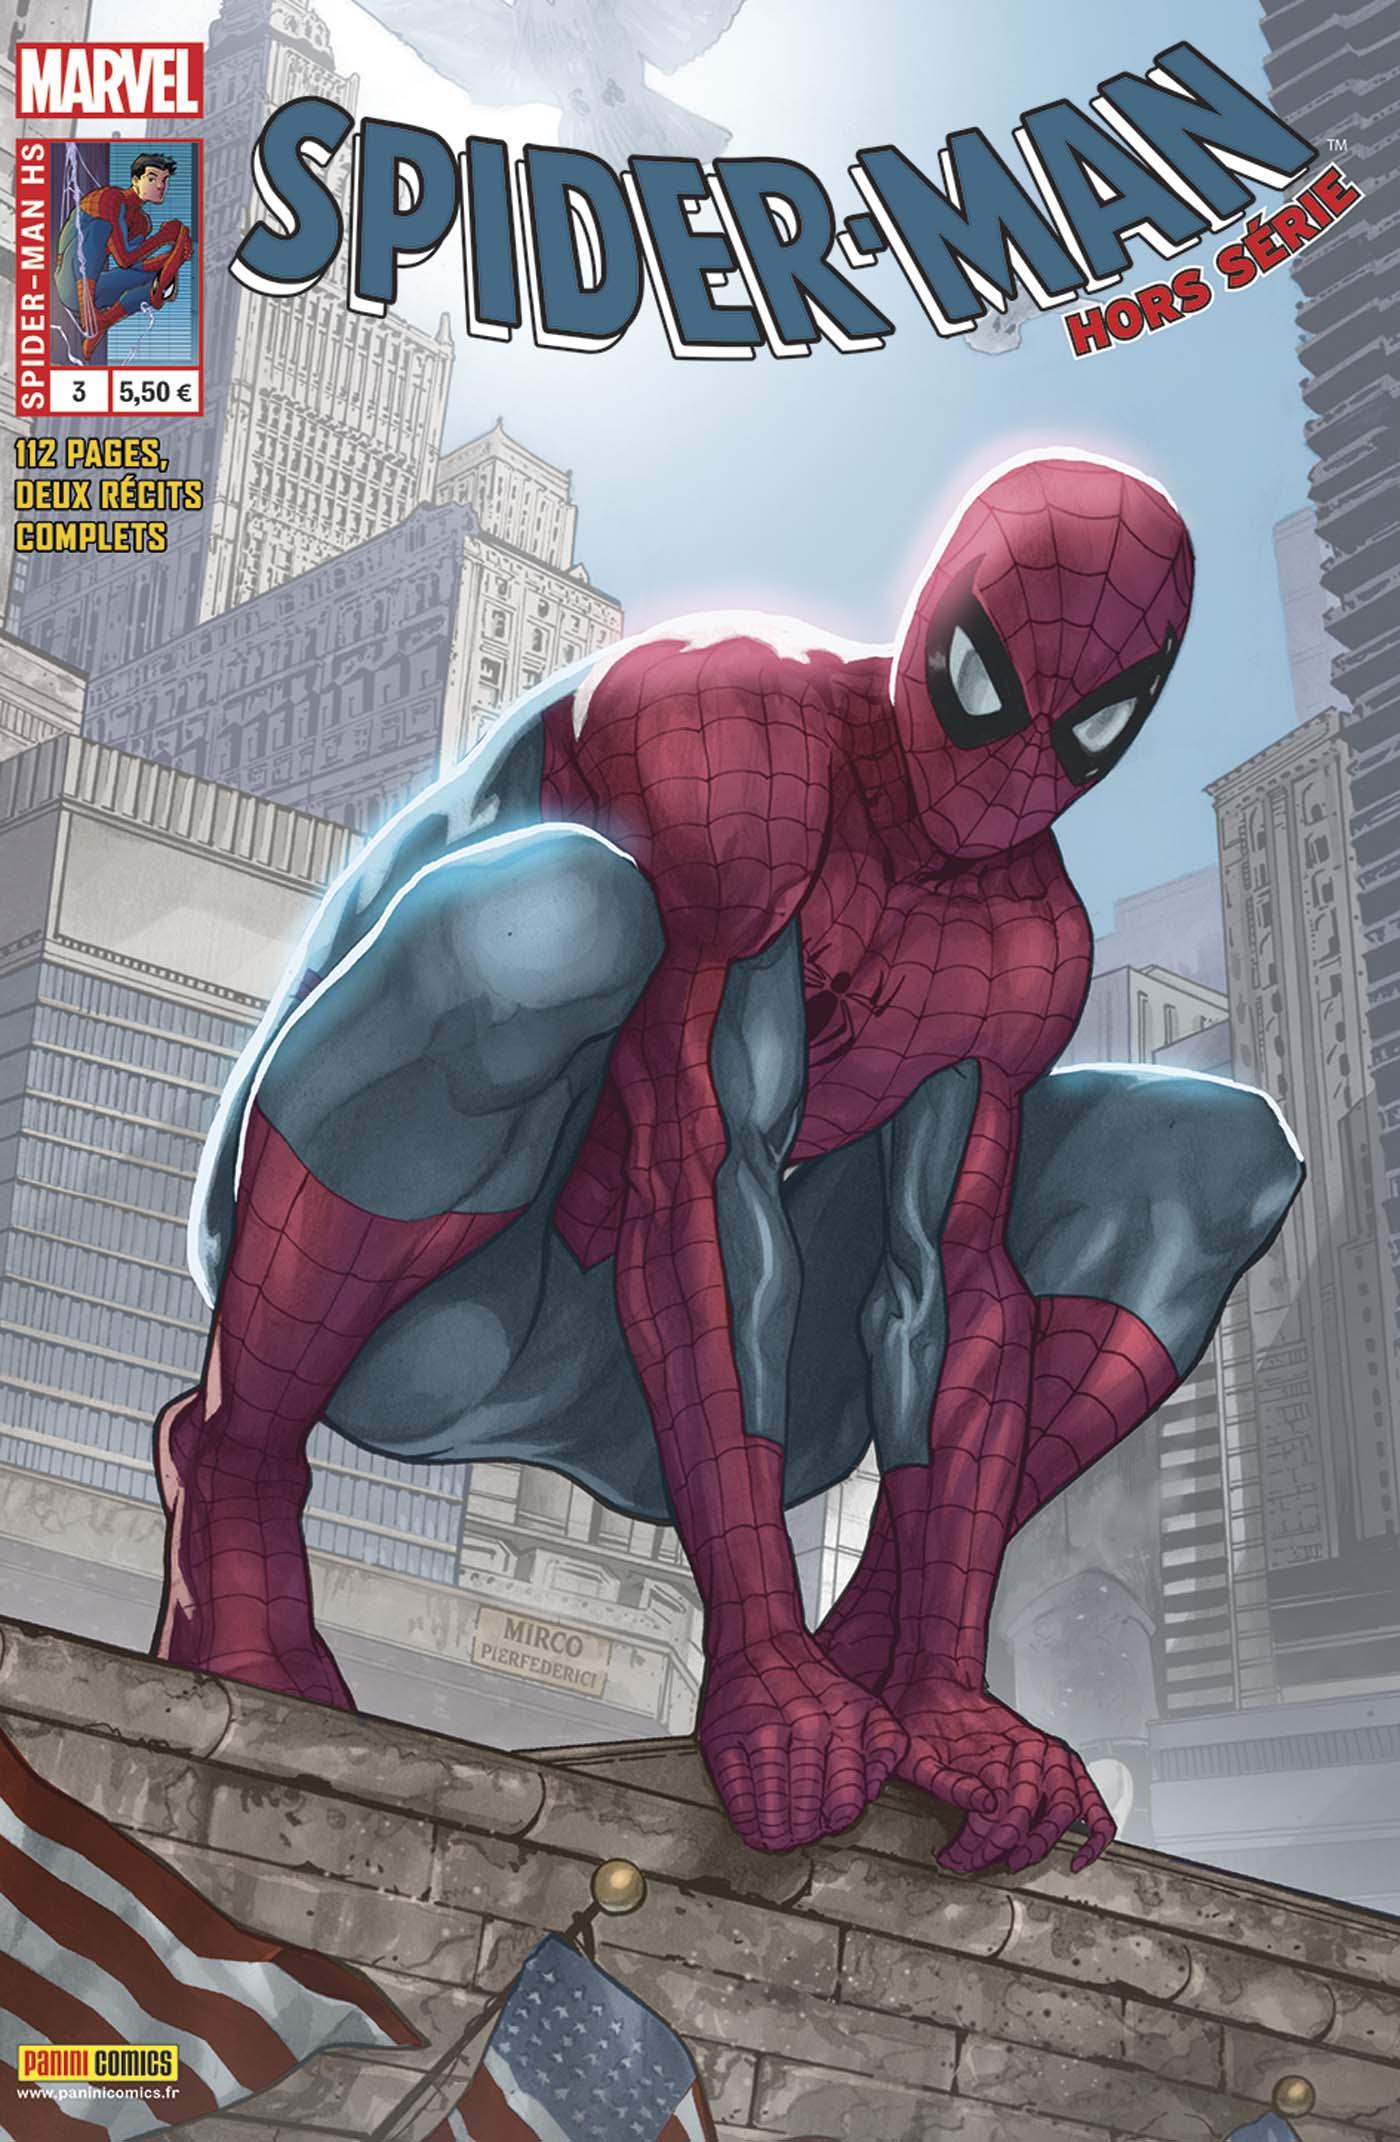 Spider-Man Hors Série 3 - AMAZING SPIDER-MAN 700